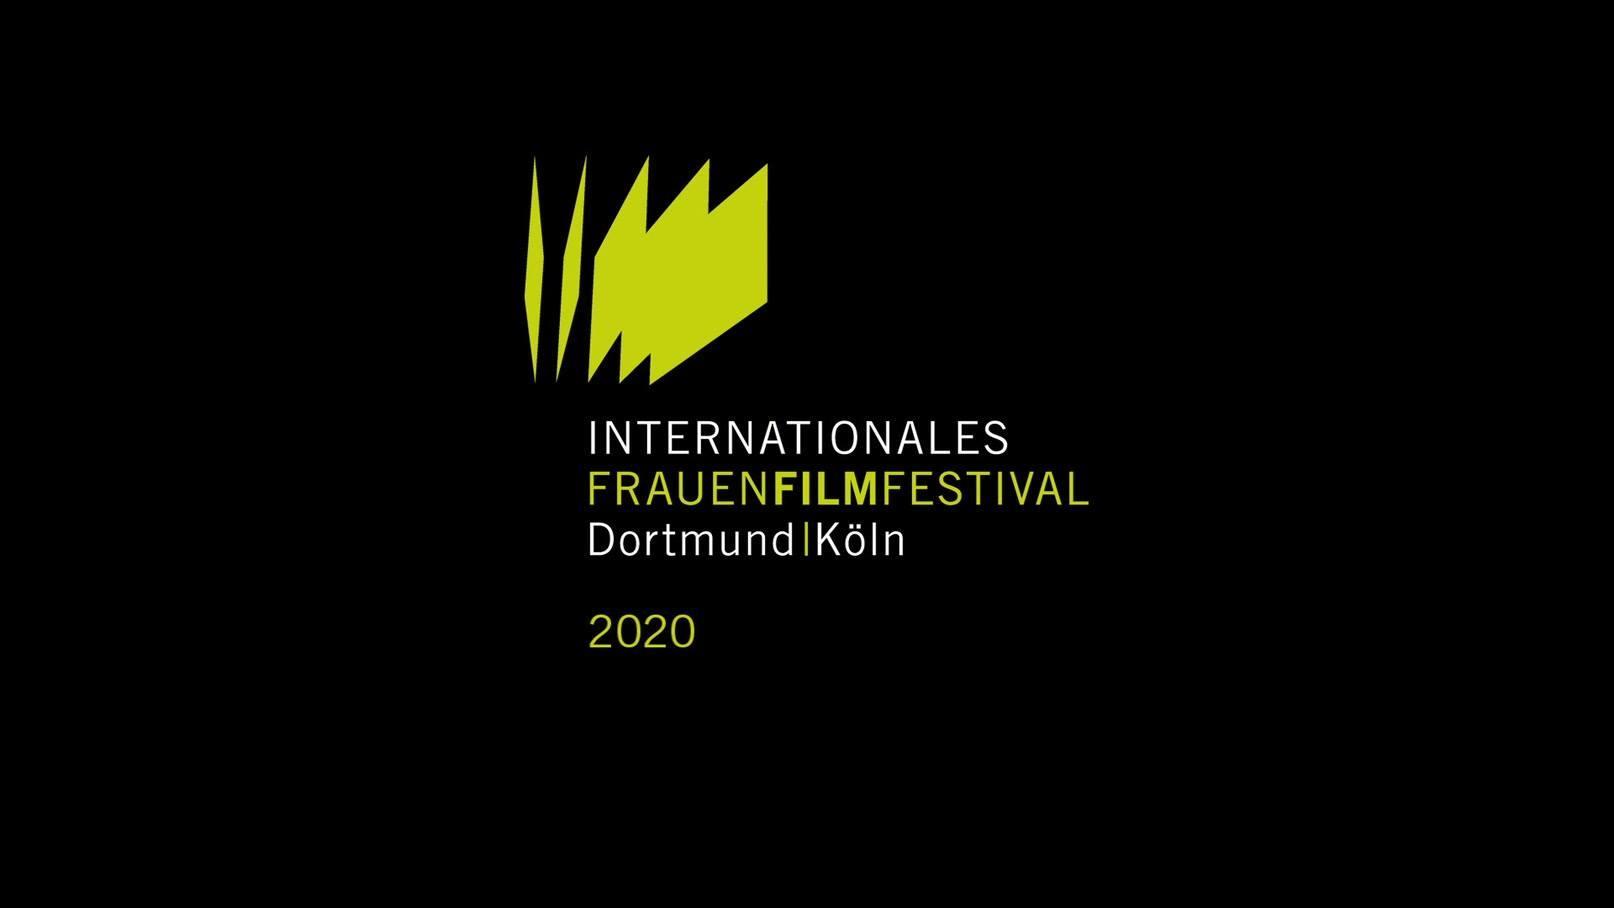 IntInternationaleInternationales Frauenfilmfestival Dortmund|Kölns Frauenfilmfestival Dortmund|Kölnernationales Frauenfilmfestival Dortmund|Köln